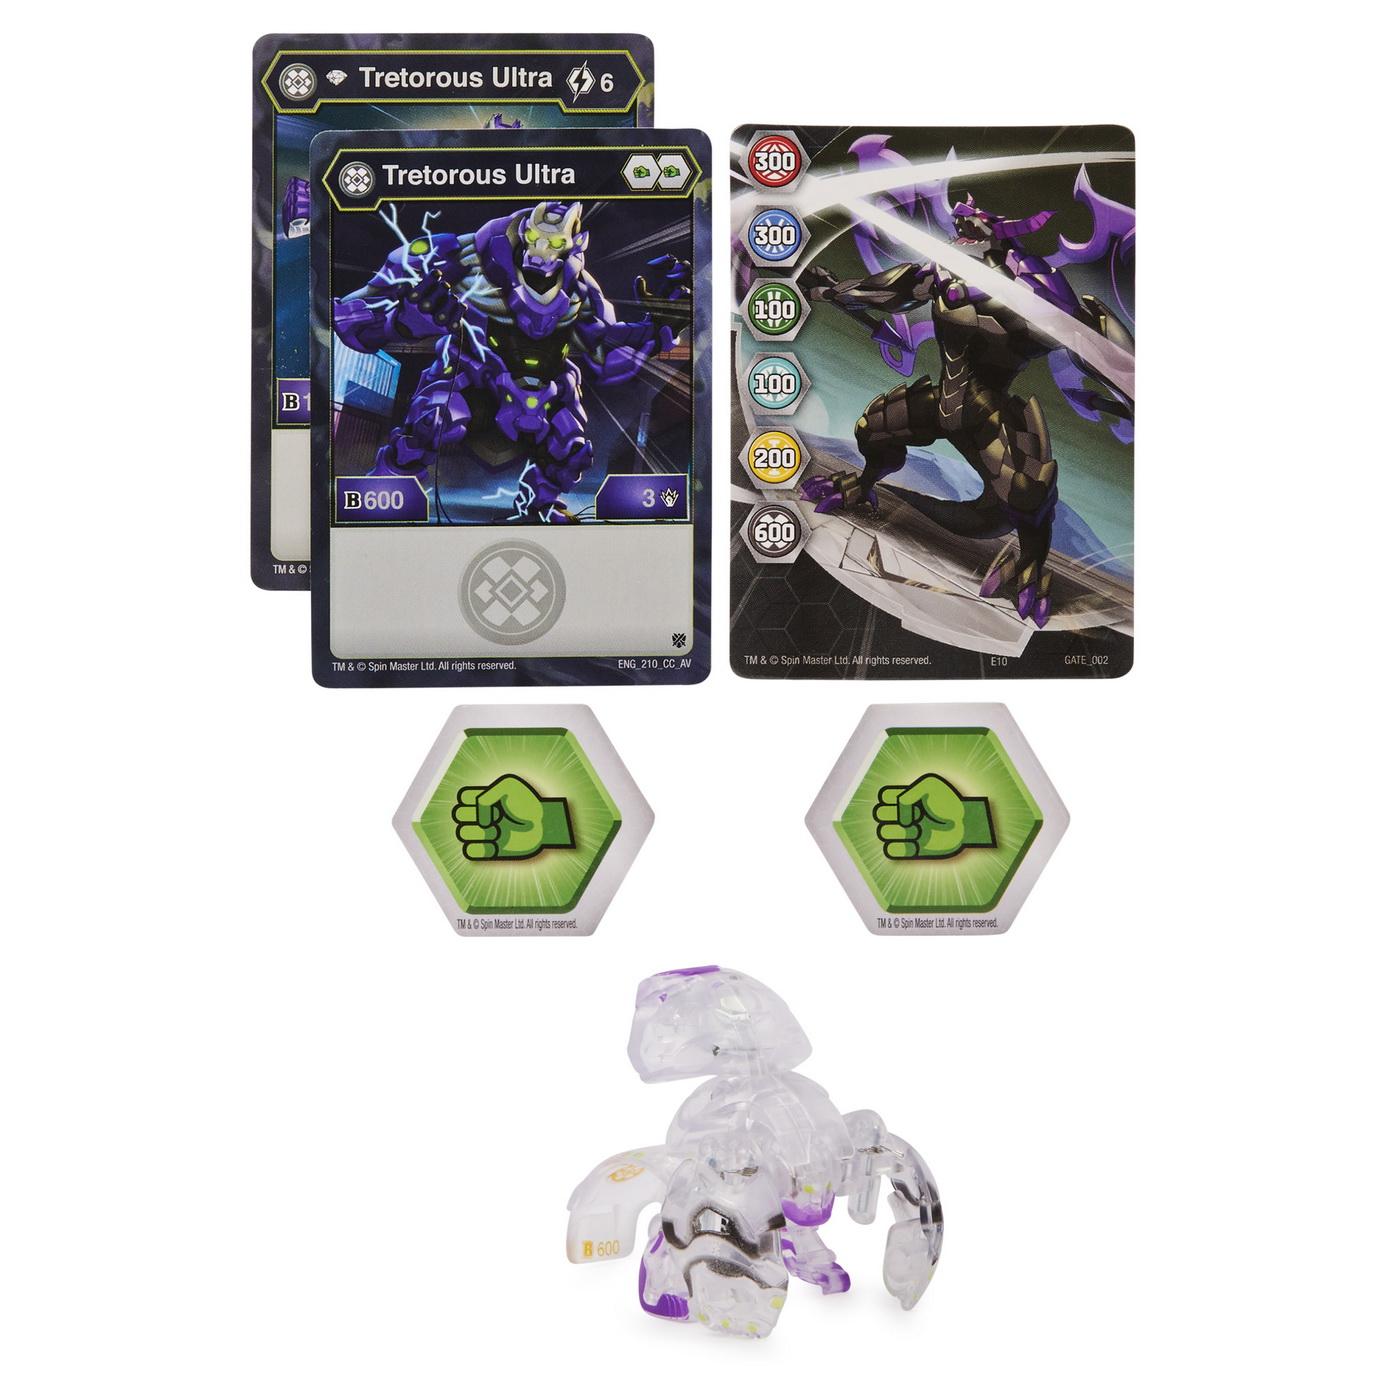 Jucarii copii Bakugan S2 bila Ultra Tretorous cu card Baku-Gear